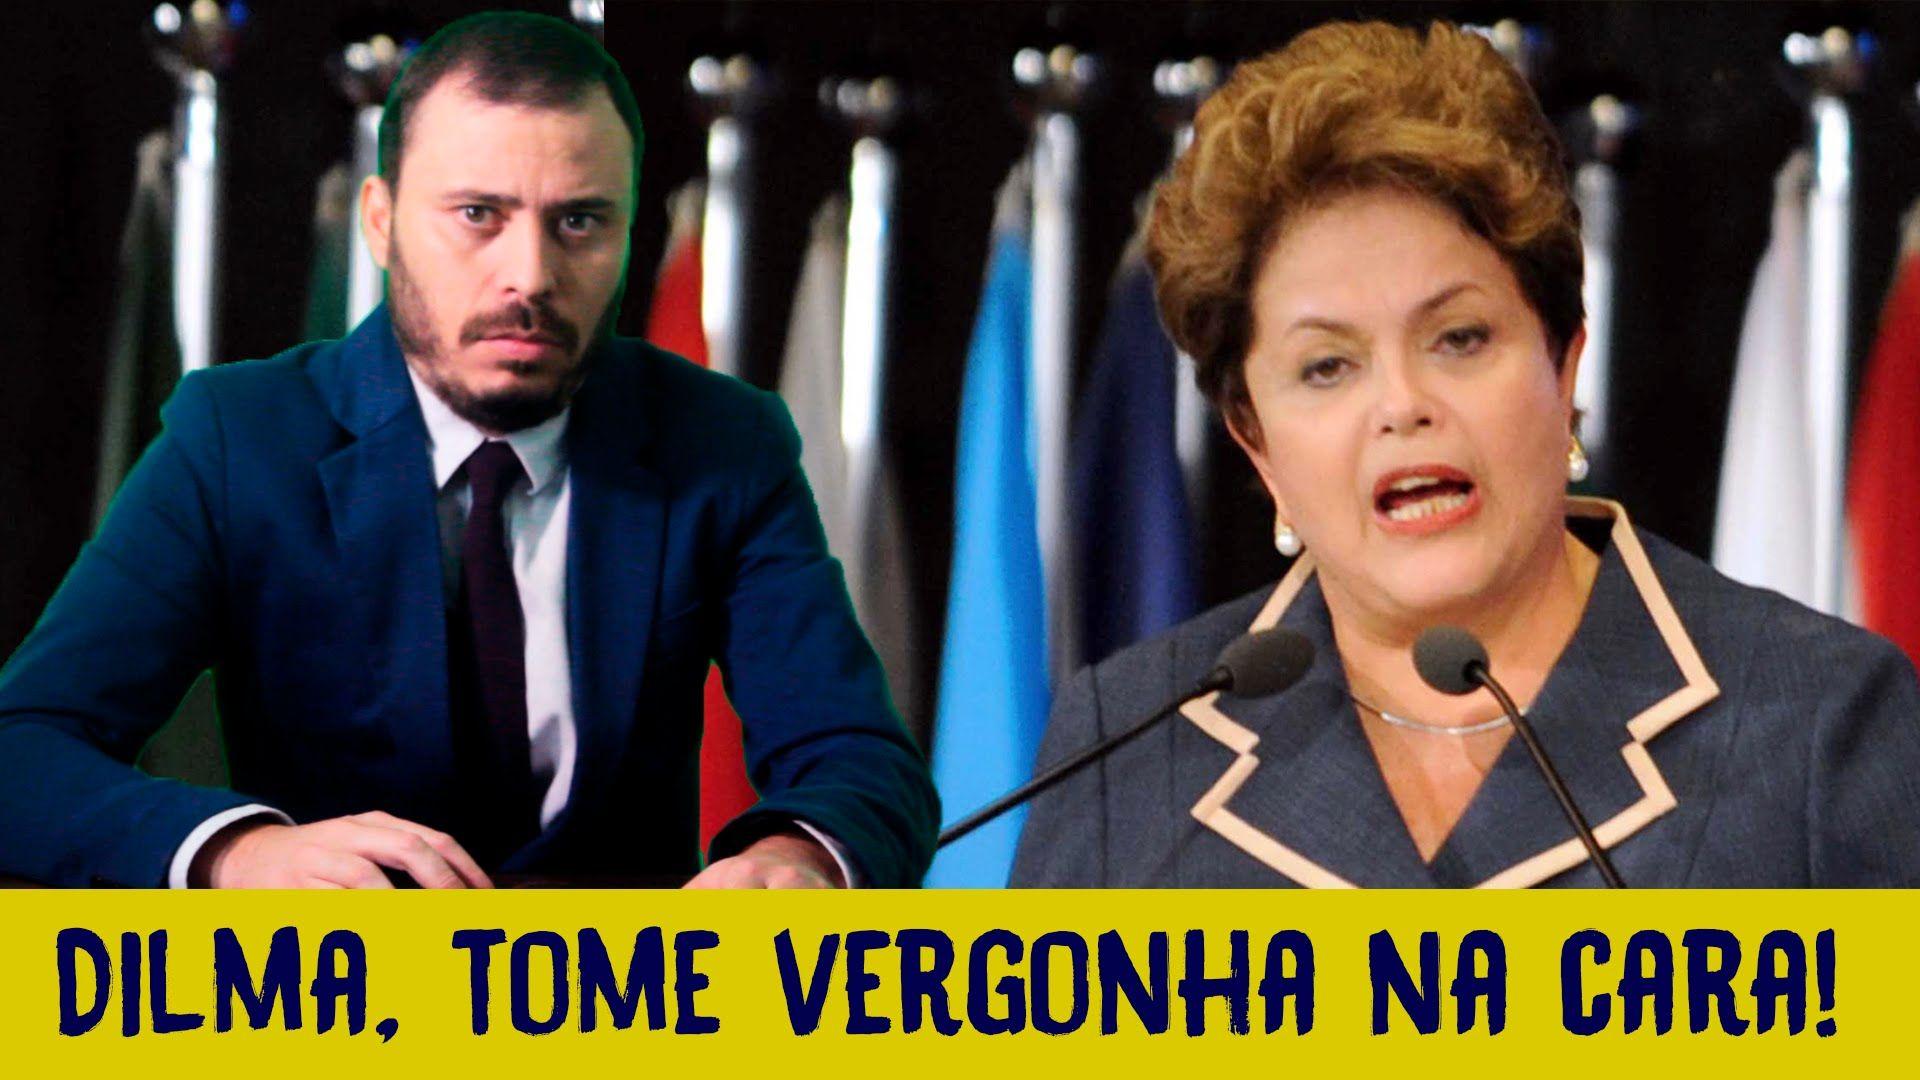 Dilma, tome vergonha na cara!